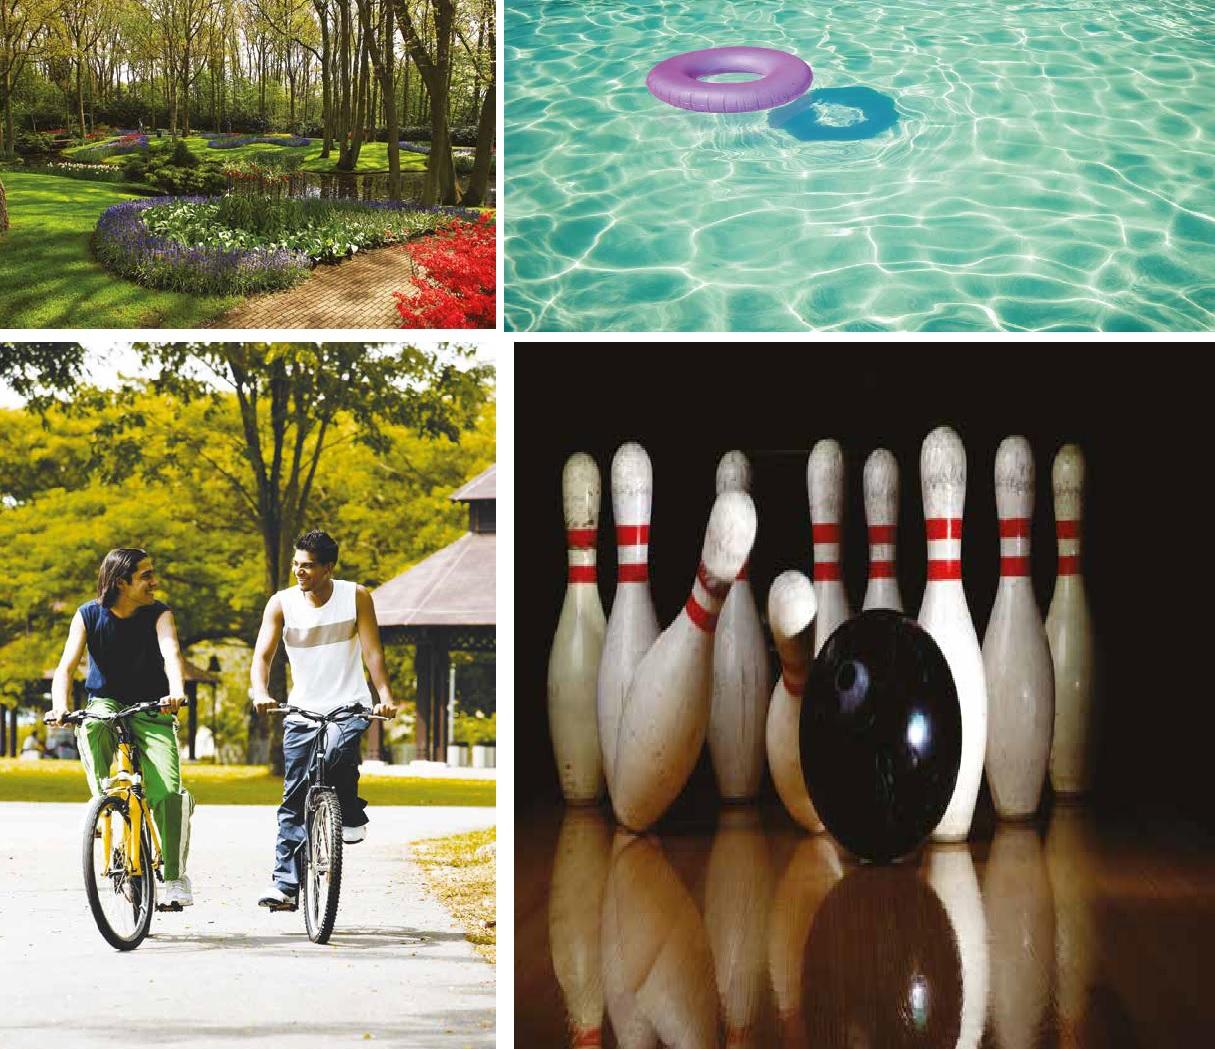 ozone urbana aqua amenities features4